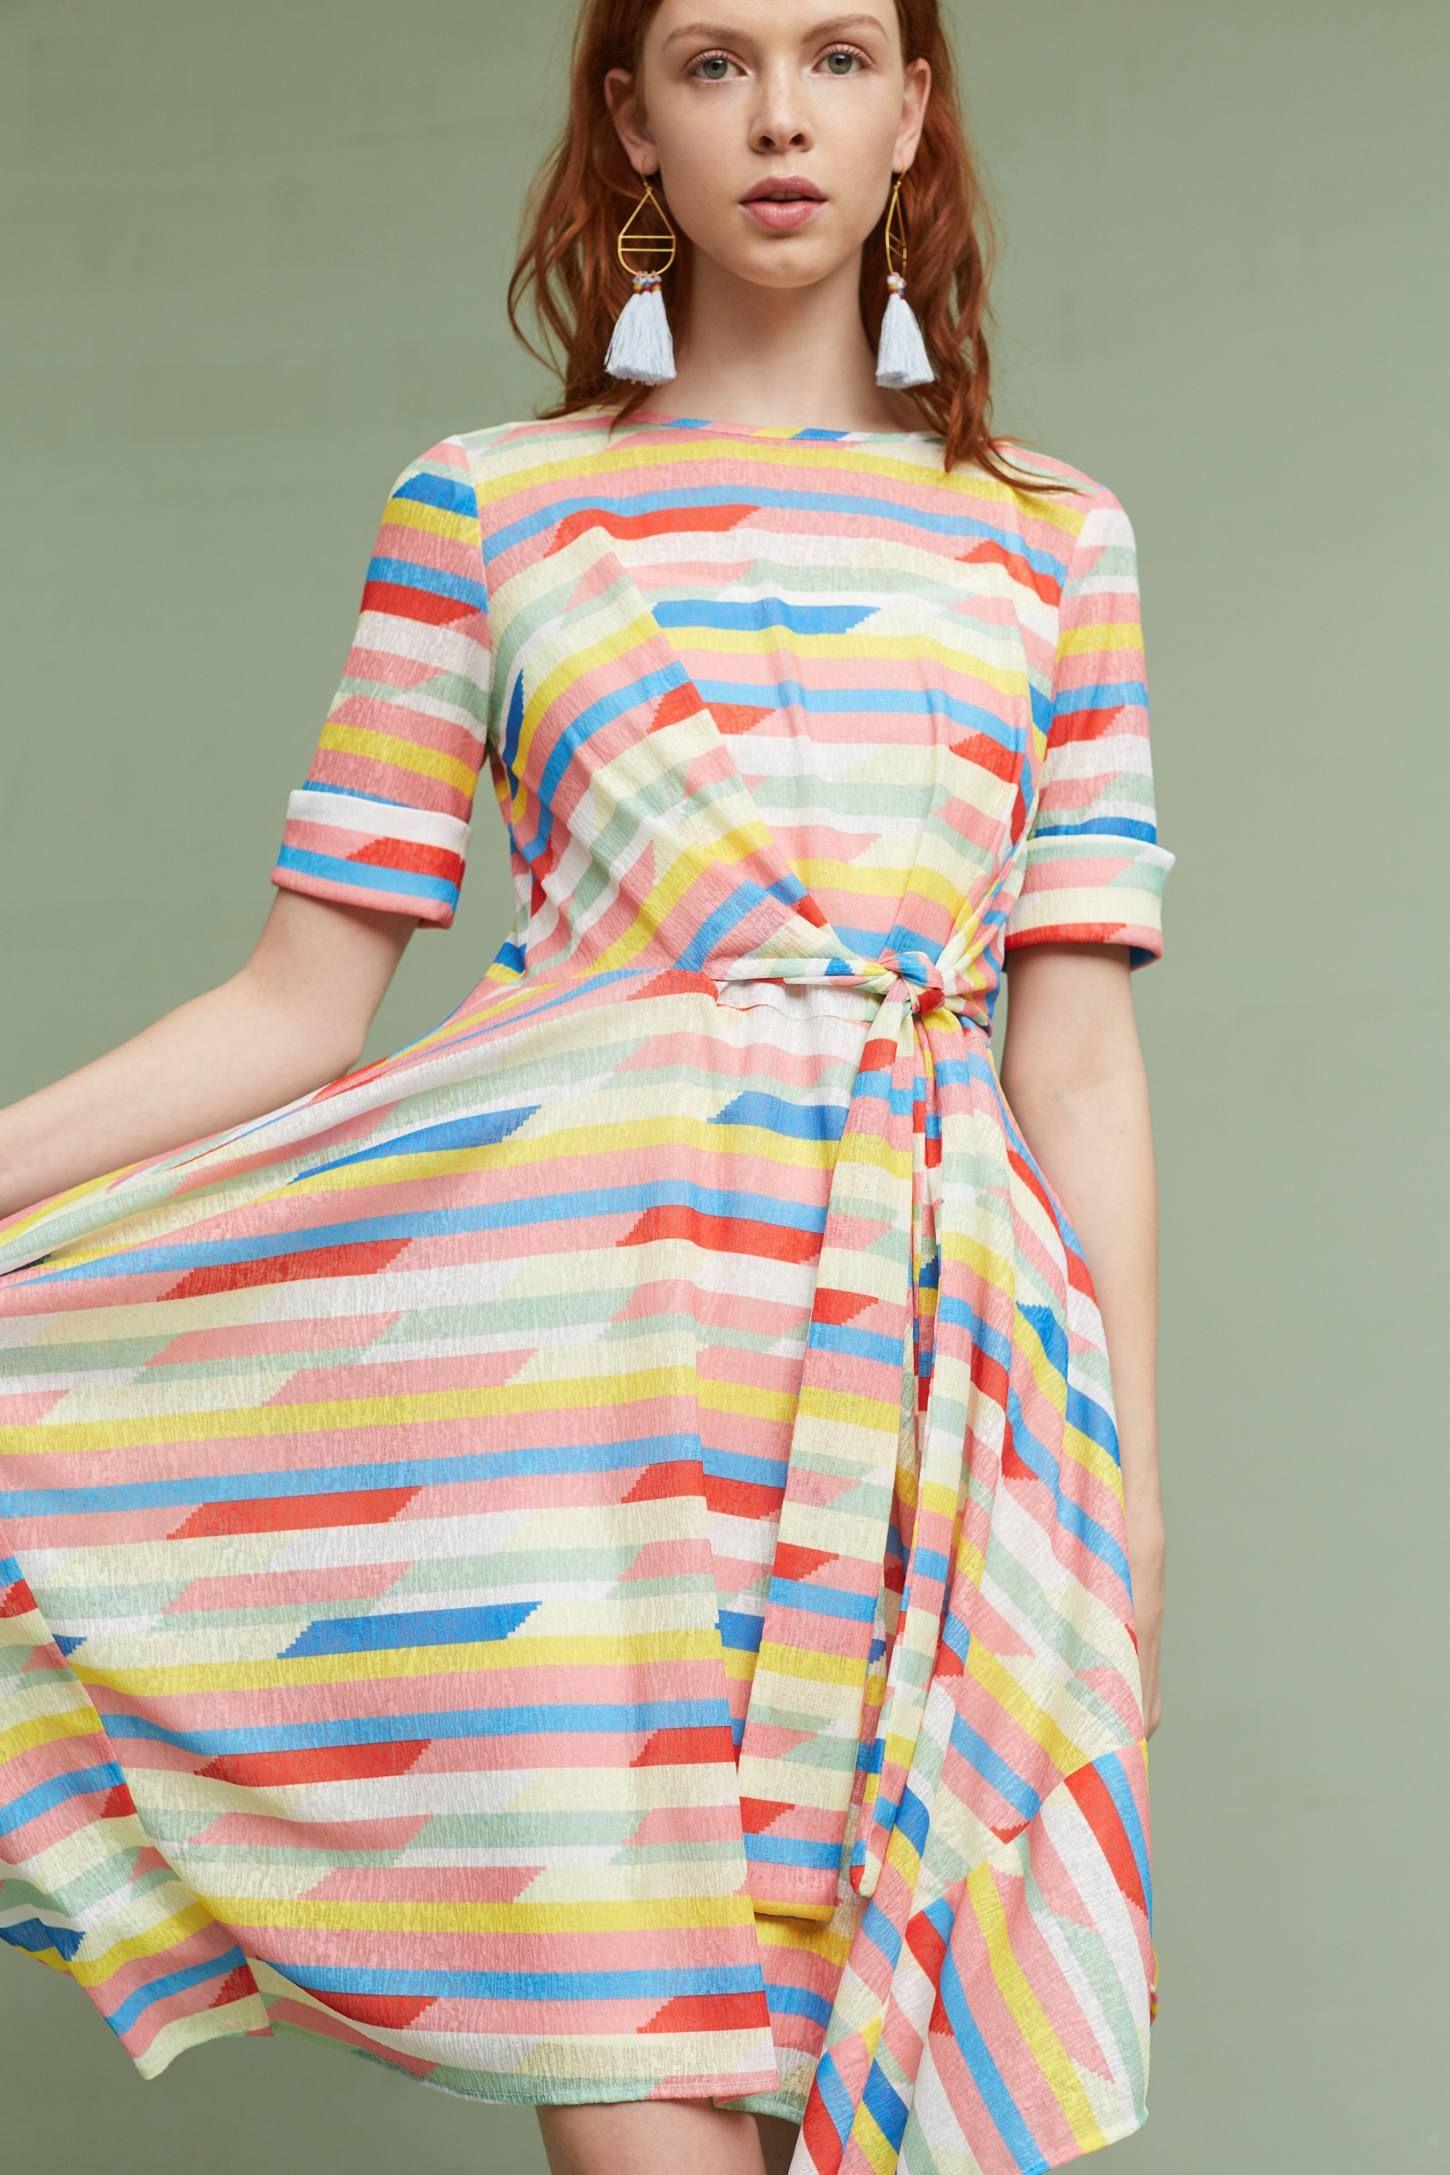 Carrie tiewaist dress dresses beautiful outfits fashion